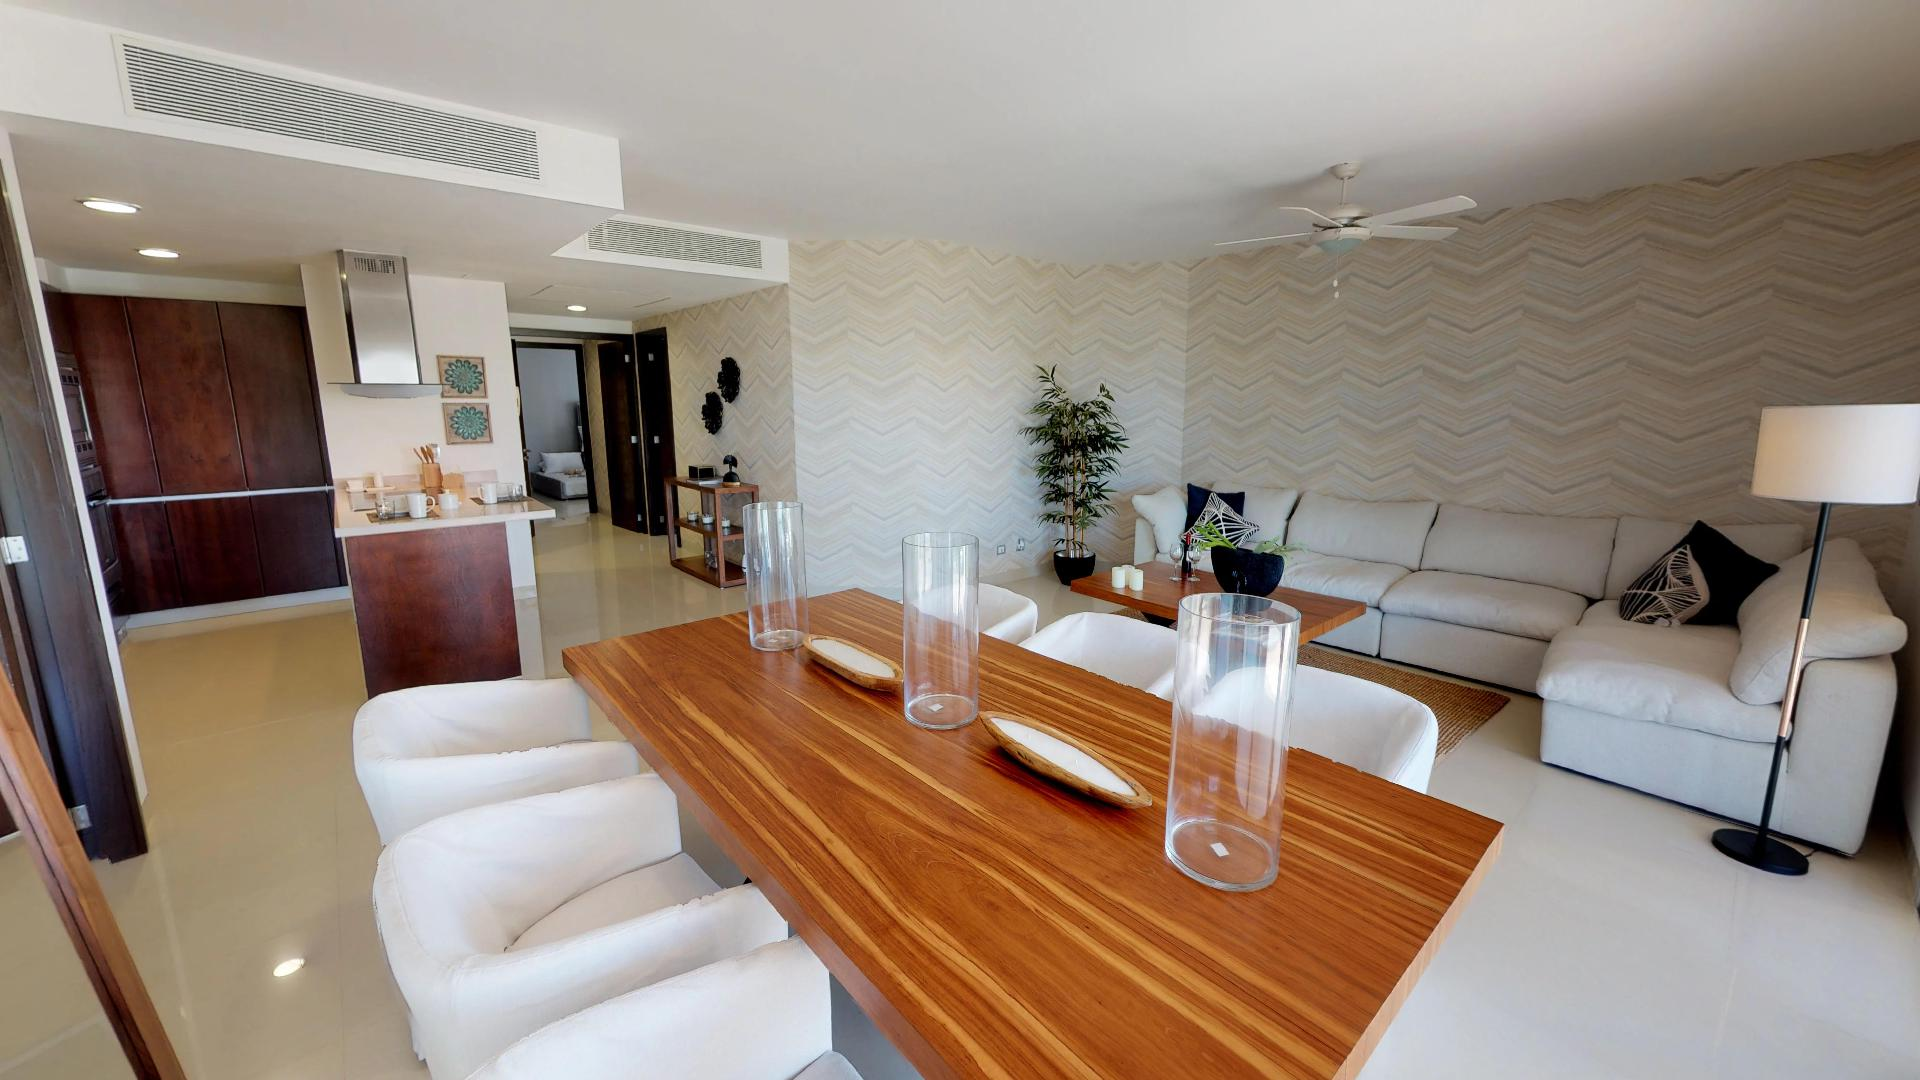 Luxury 3 Bedroom Condo in Exclusive Beachfront Community!